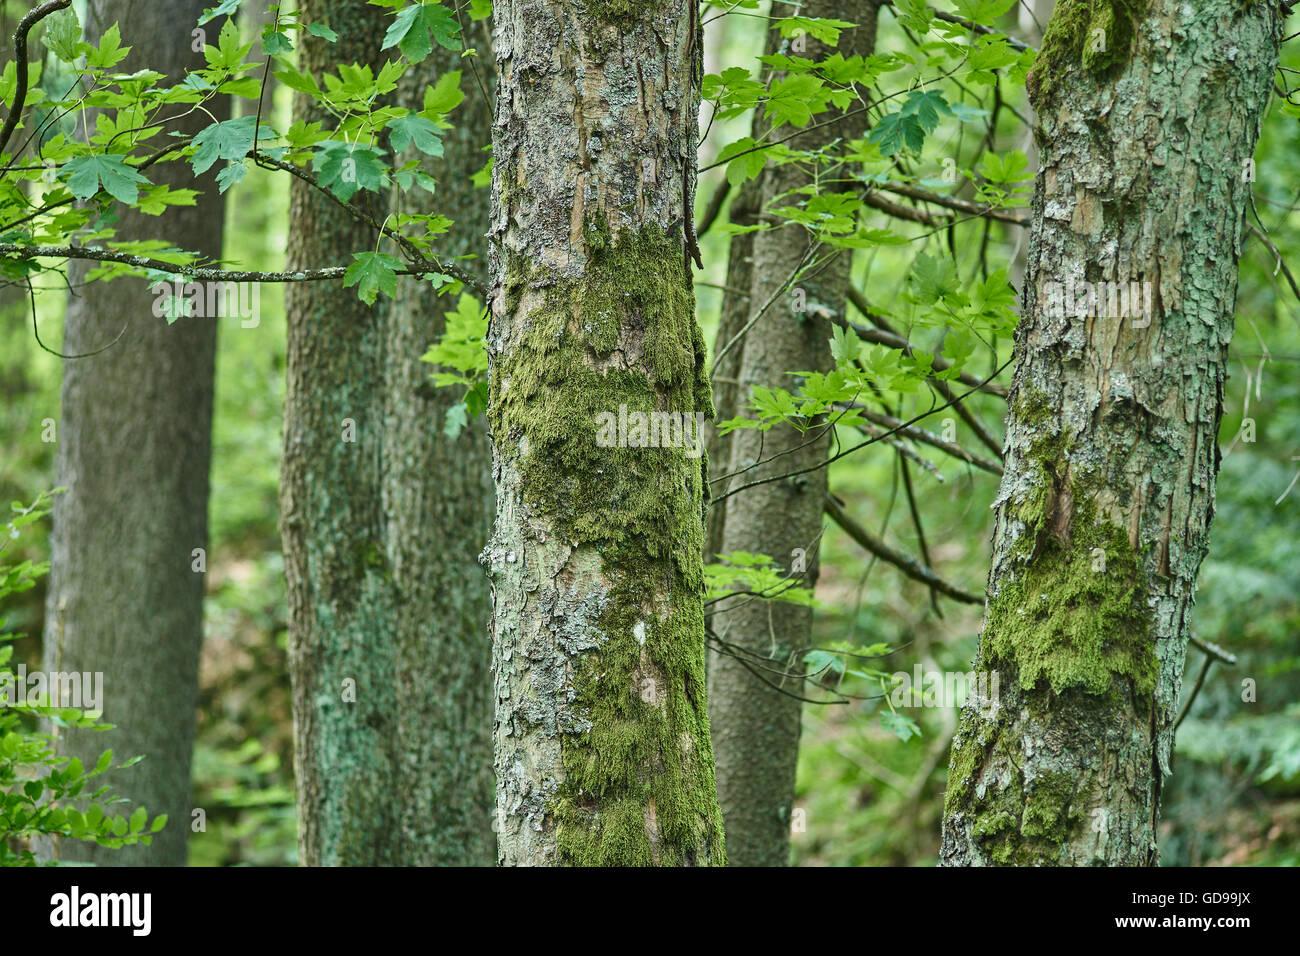 Lichens On Tree Bark Green Stock Photos & Lichens On Tree Bark Green ...